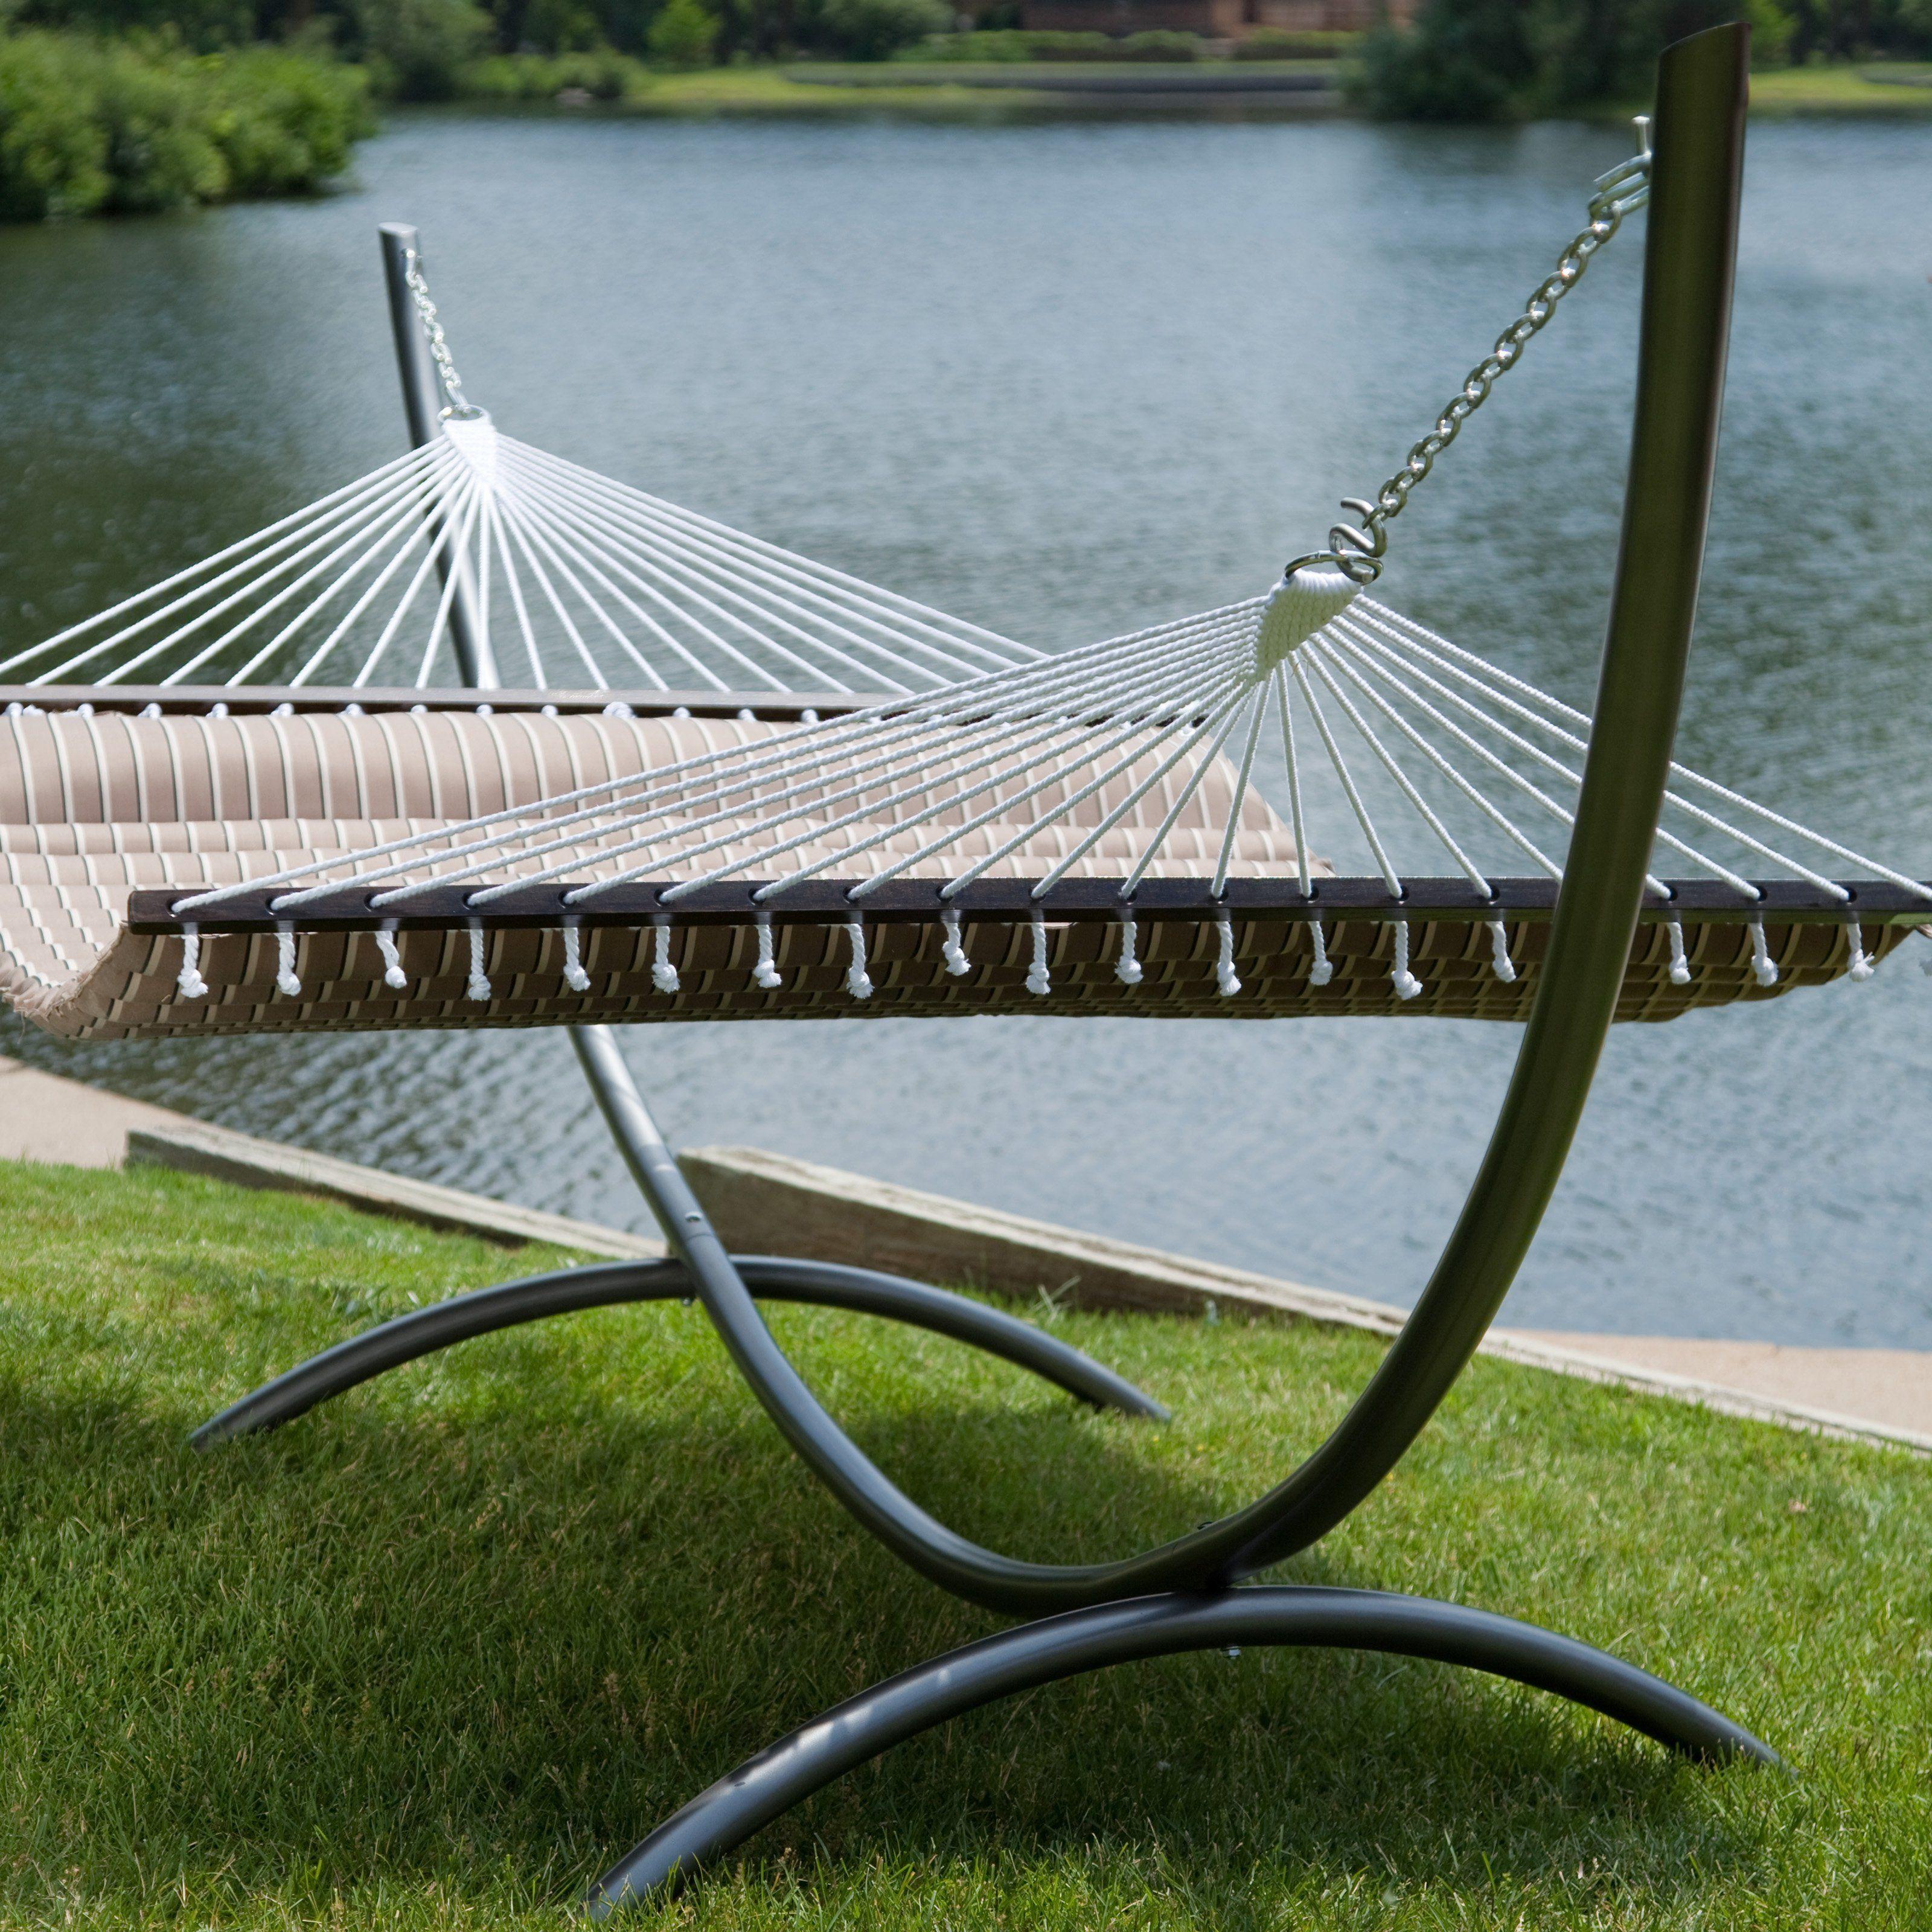 Island bay verona steel arc hammock stand products pinterest